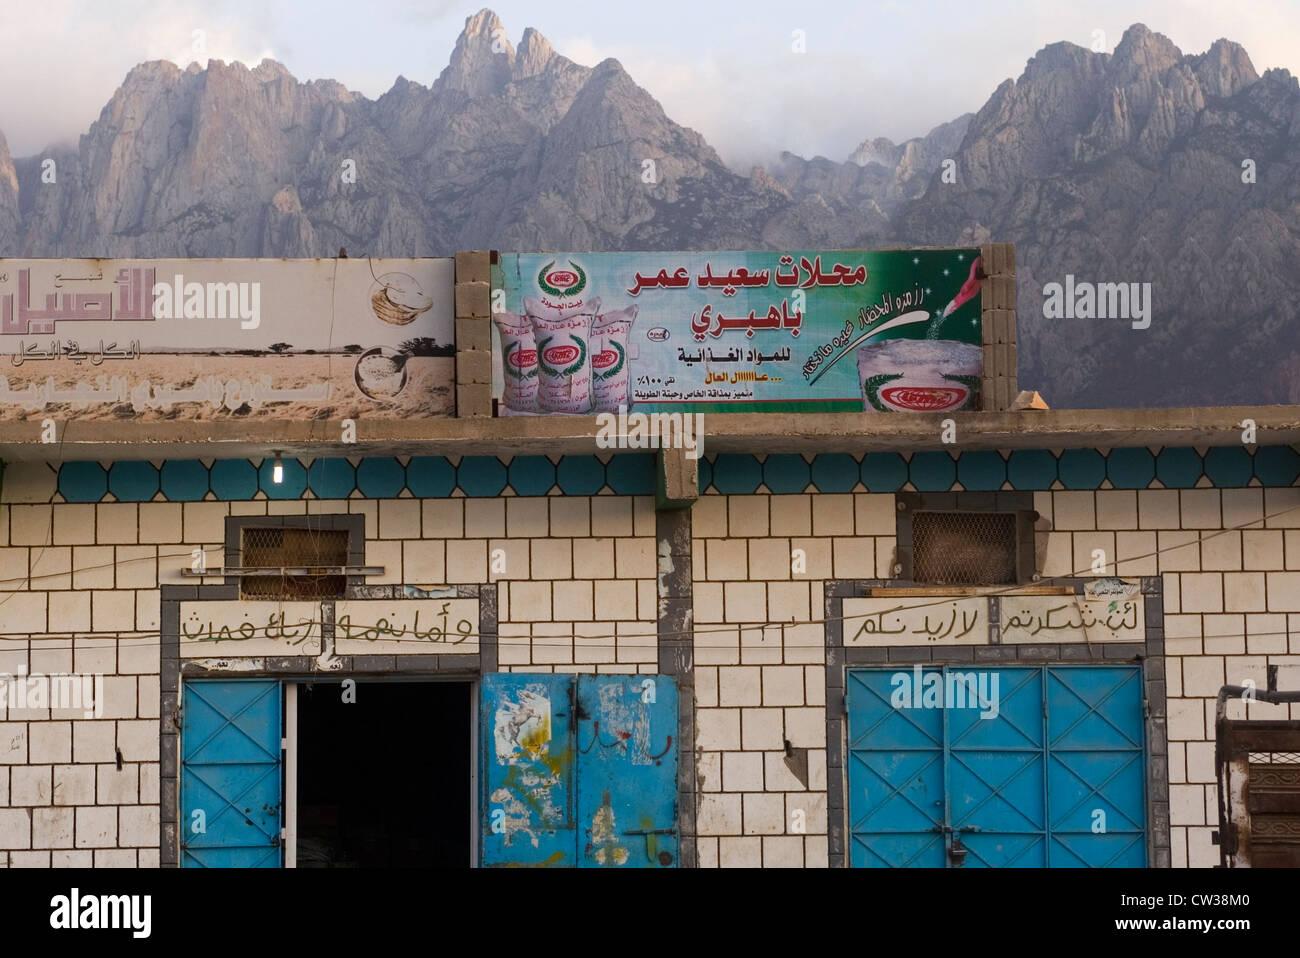 Shops in the Village of Hadibo, Socotra Island, Yemen,  Western Asia, Arabian Peninsula. - Stock Image